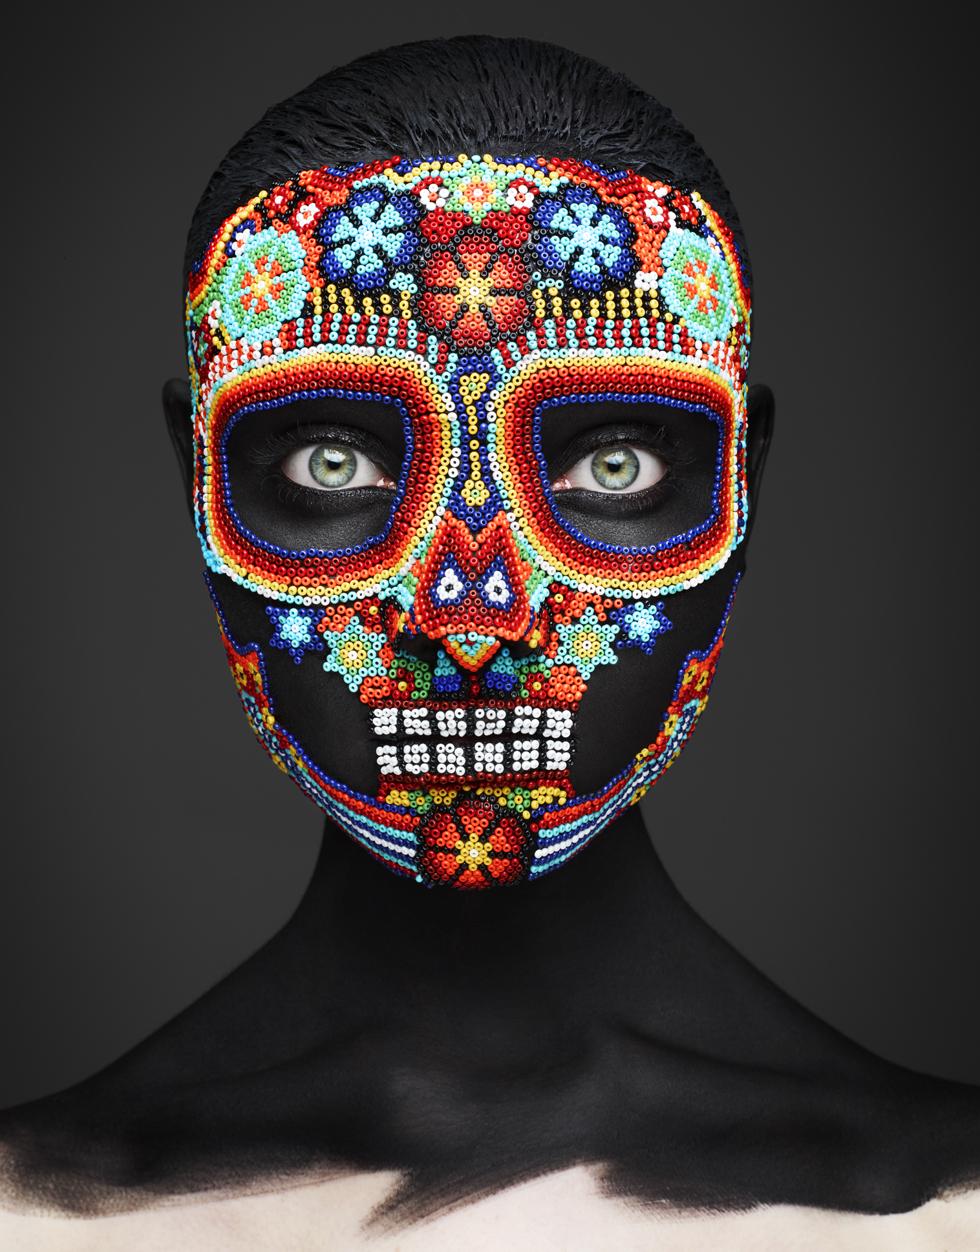 andrew-gallimore-diadelasmuertes-masks-05